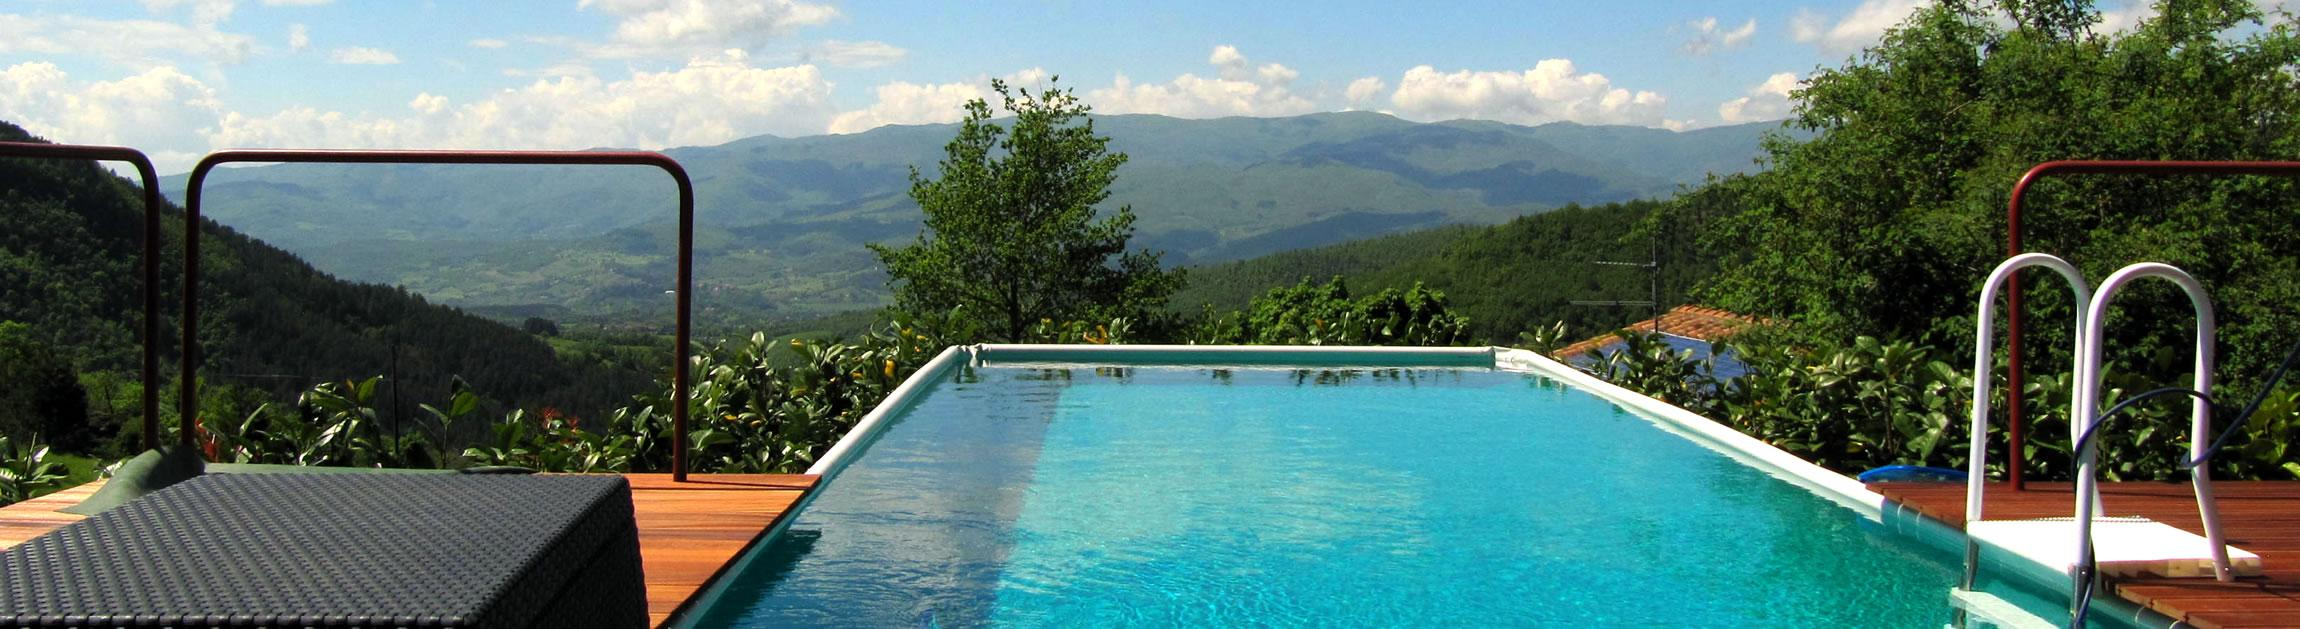 ferienhaus_toskana_pool_santi